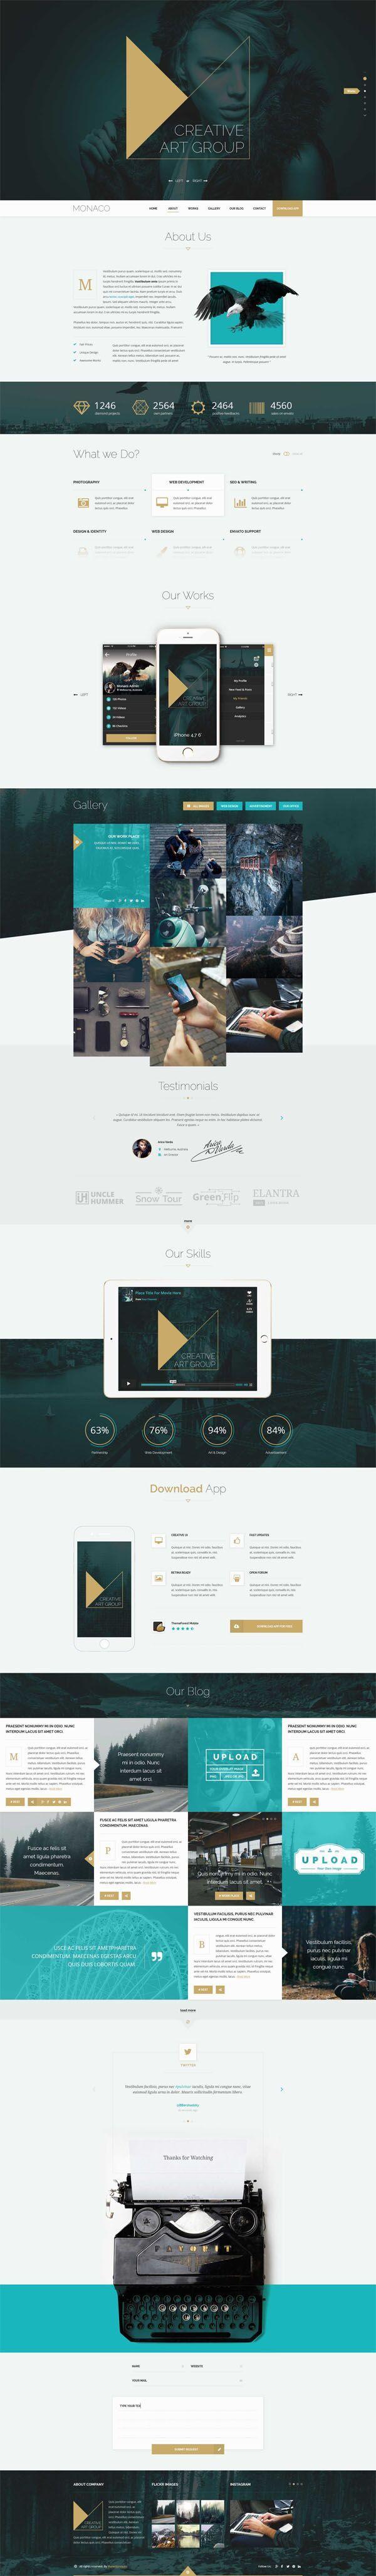 Monaco-Creative-HTML5-Bootstrap-Template